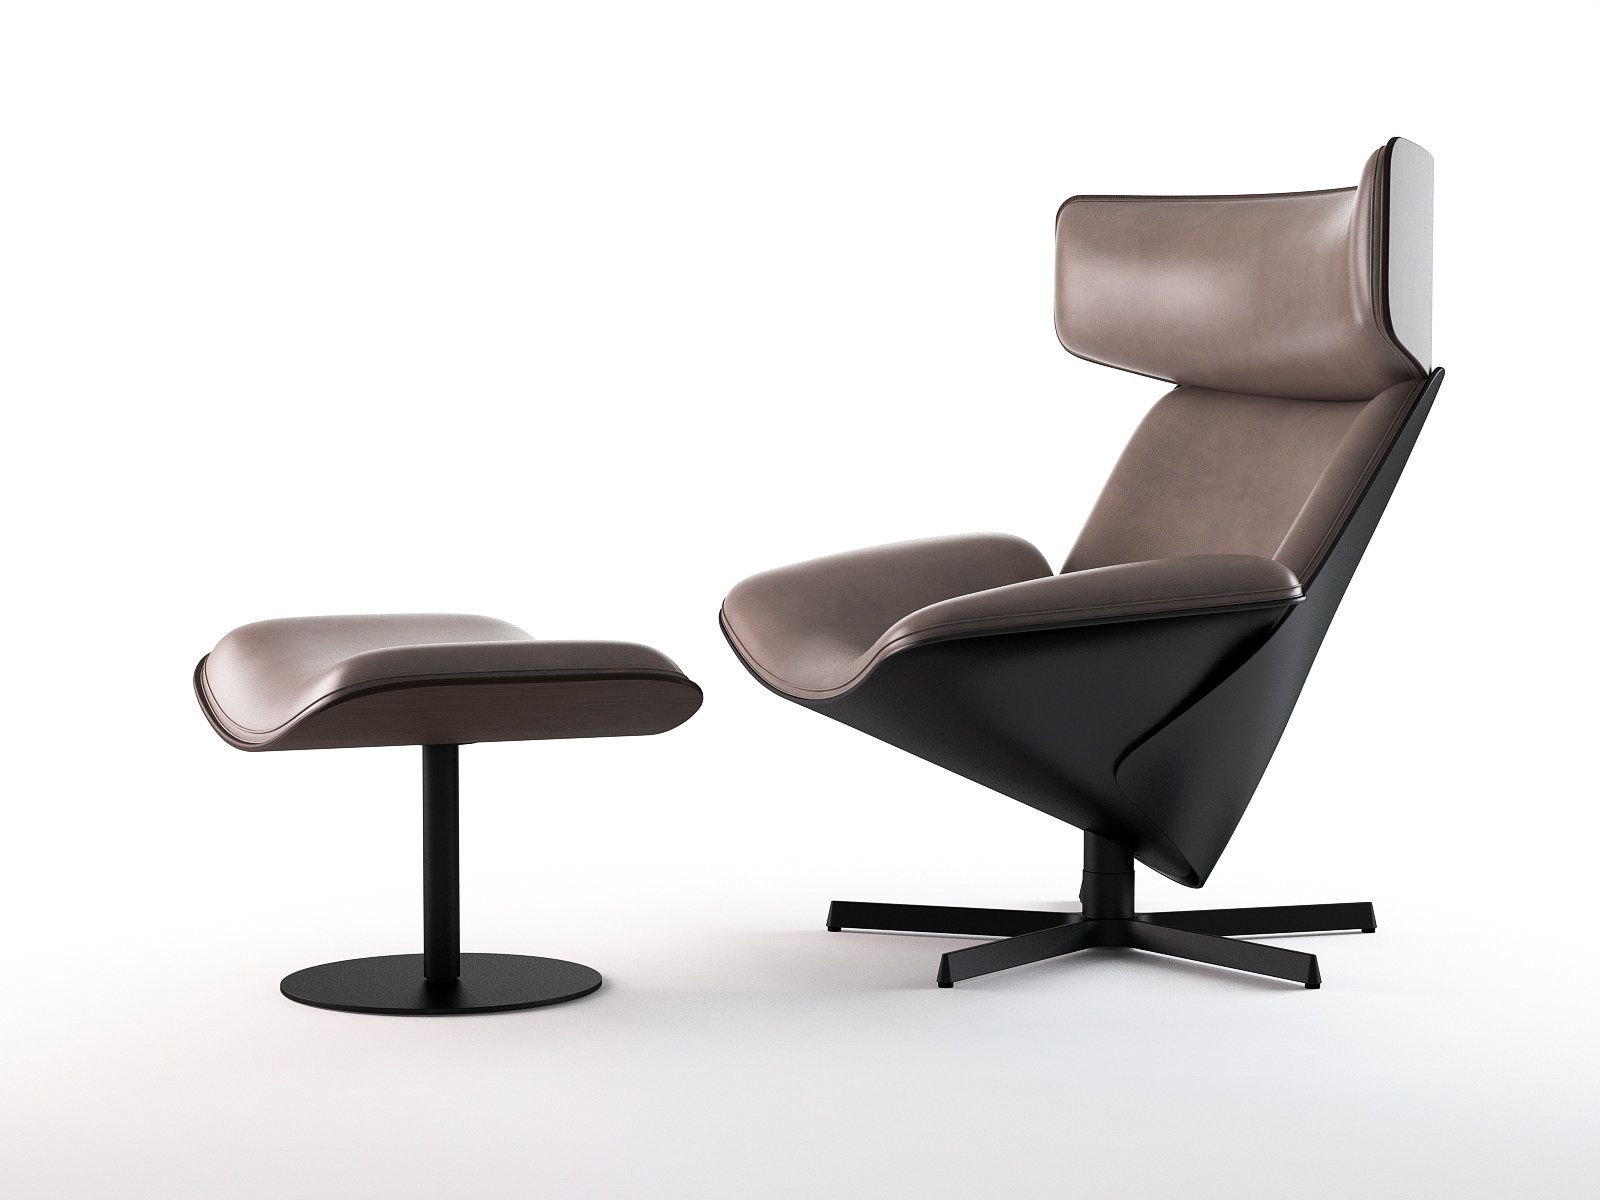 Armchair: ALMORA   Collection: Bu0026B Italia   Design: Doshi Levien |  Furniture Design | Pinterest | Armchairs, Italia And Collection